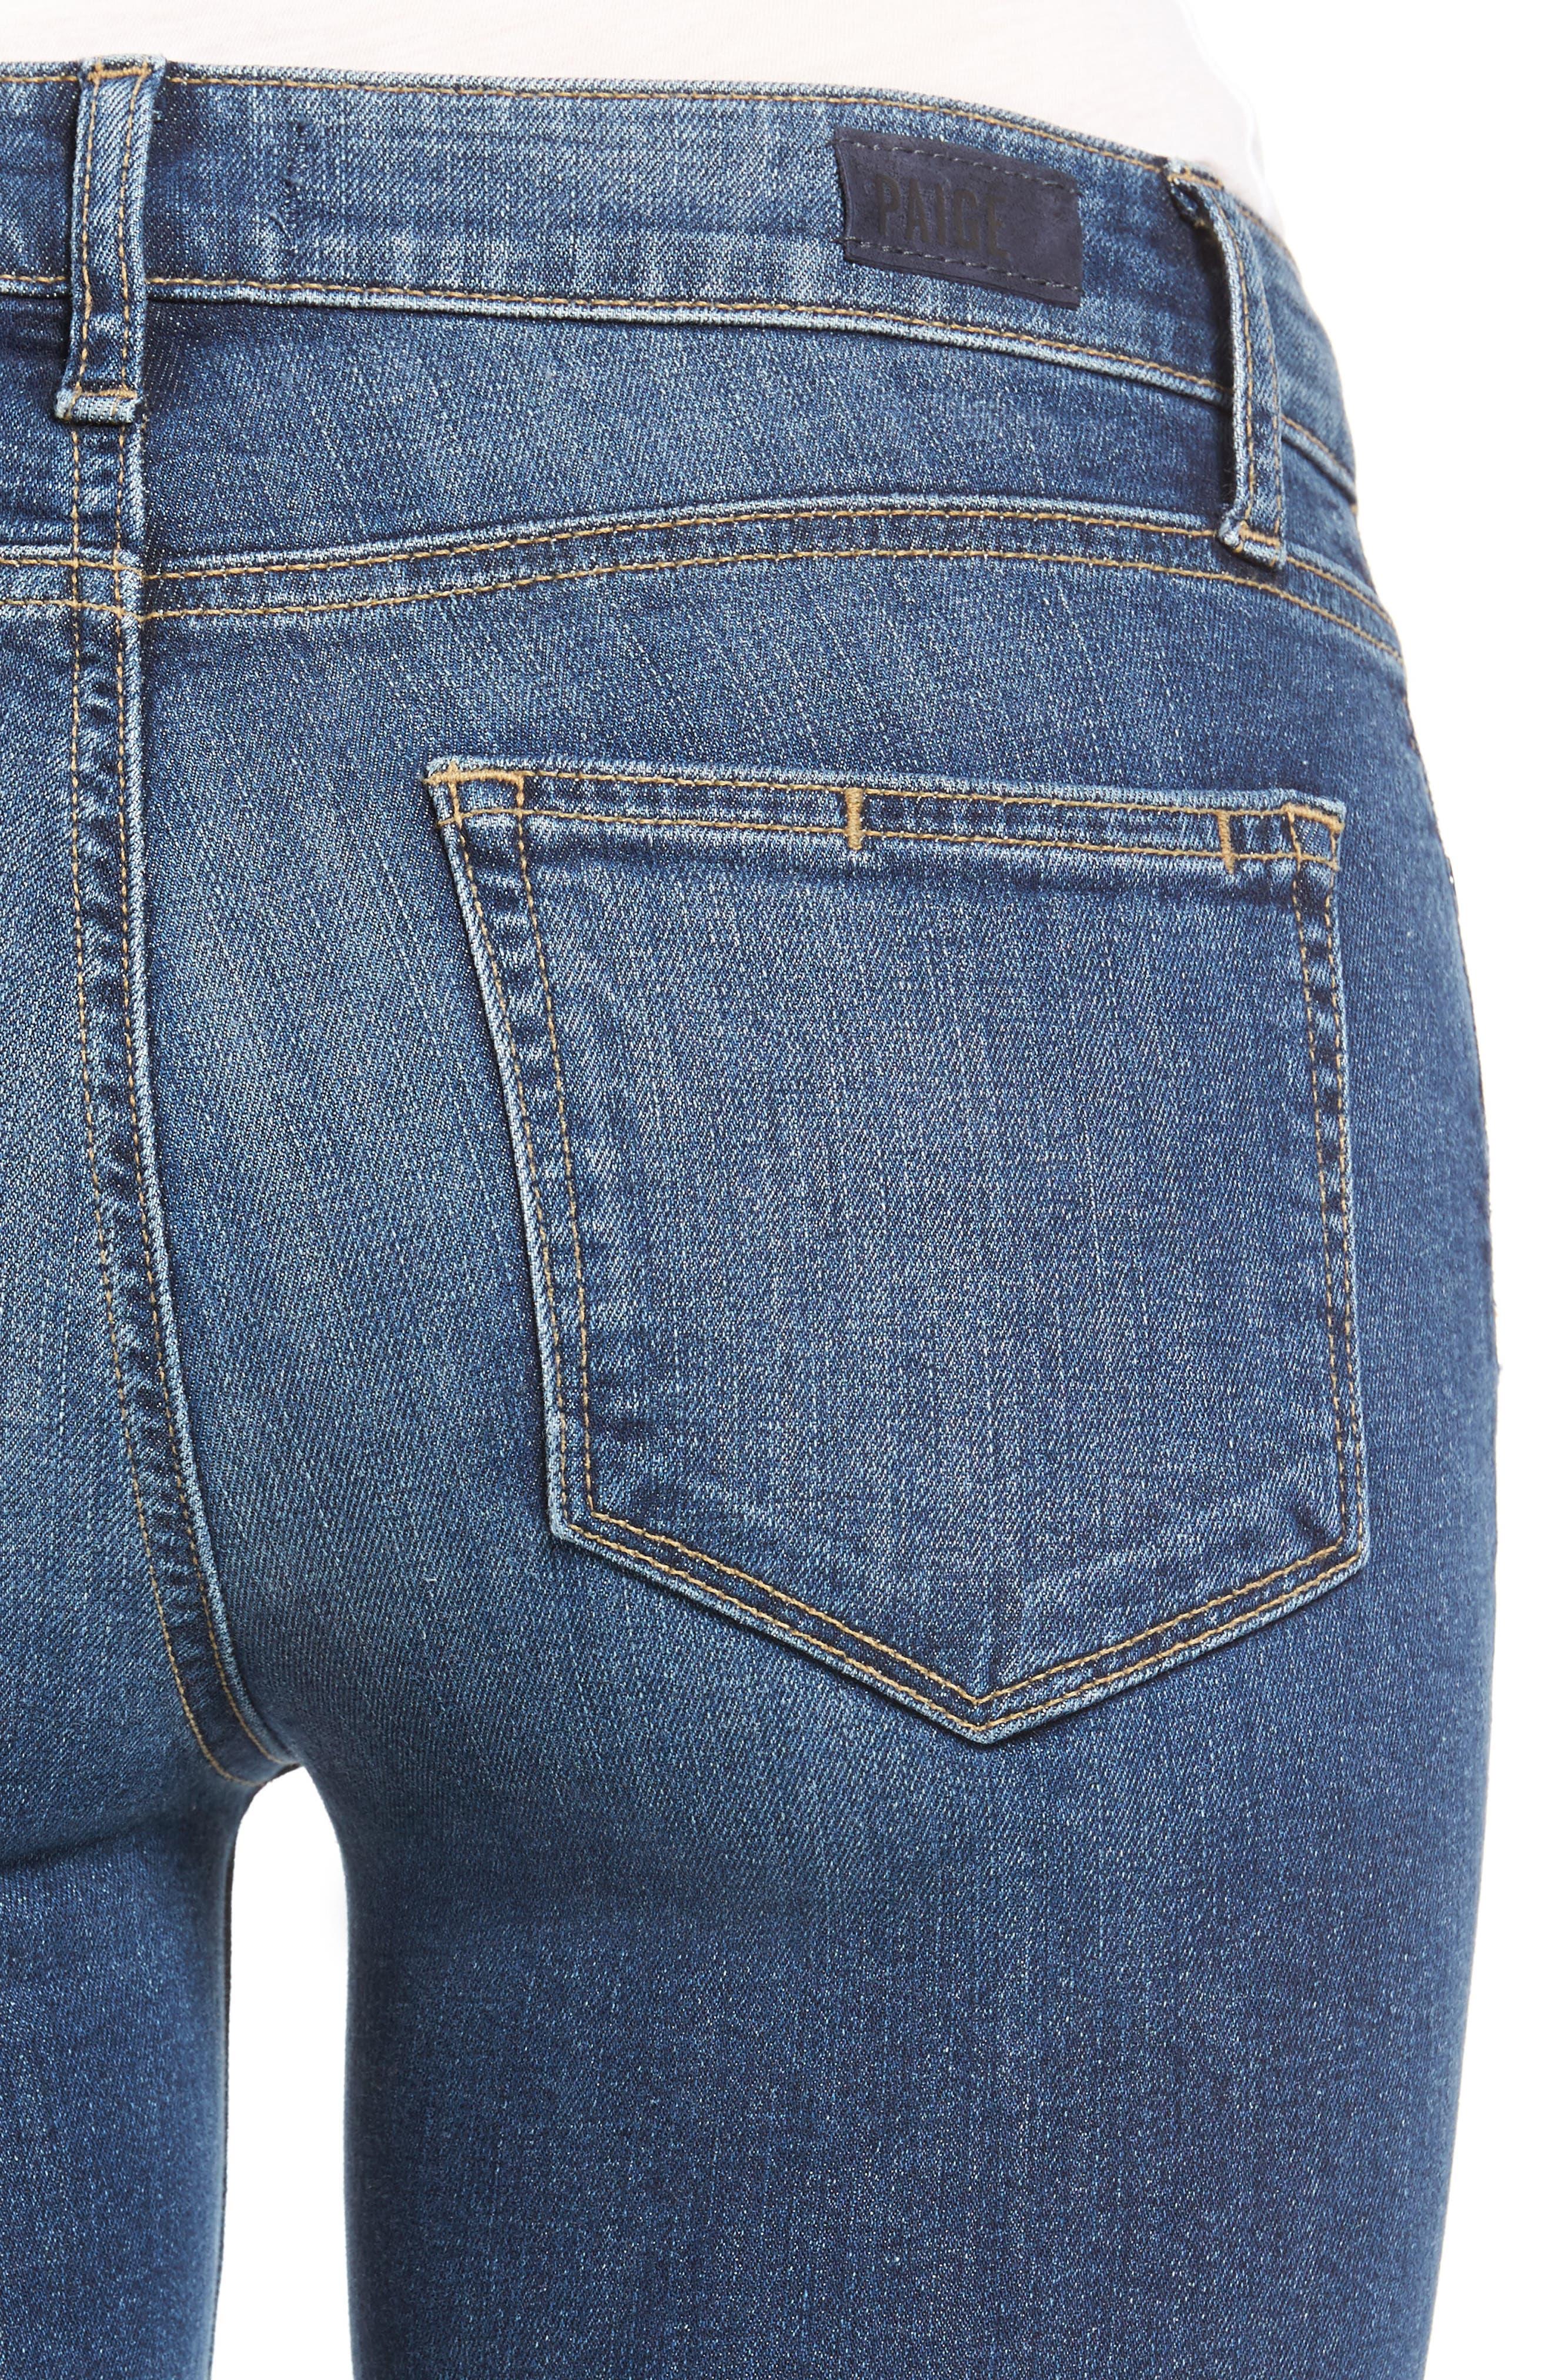 Transcend - Manhattan Bootcut Jeans,                             Alternate thumbnail 4, color,                             400